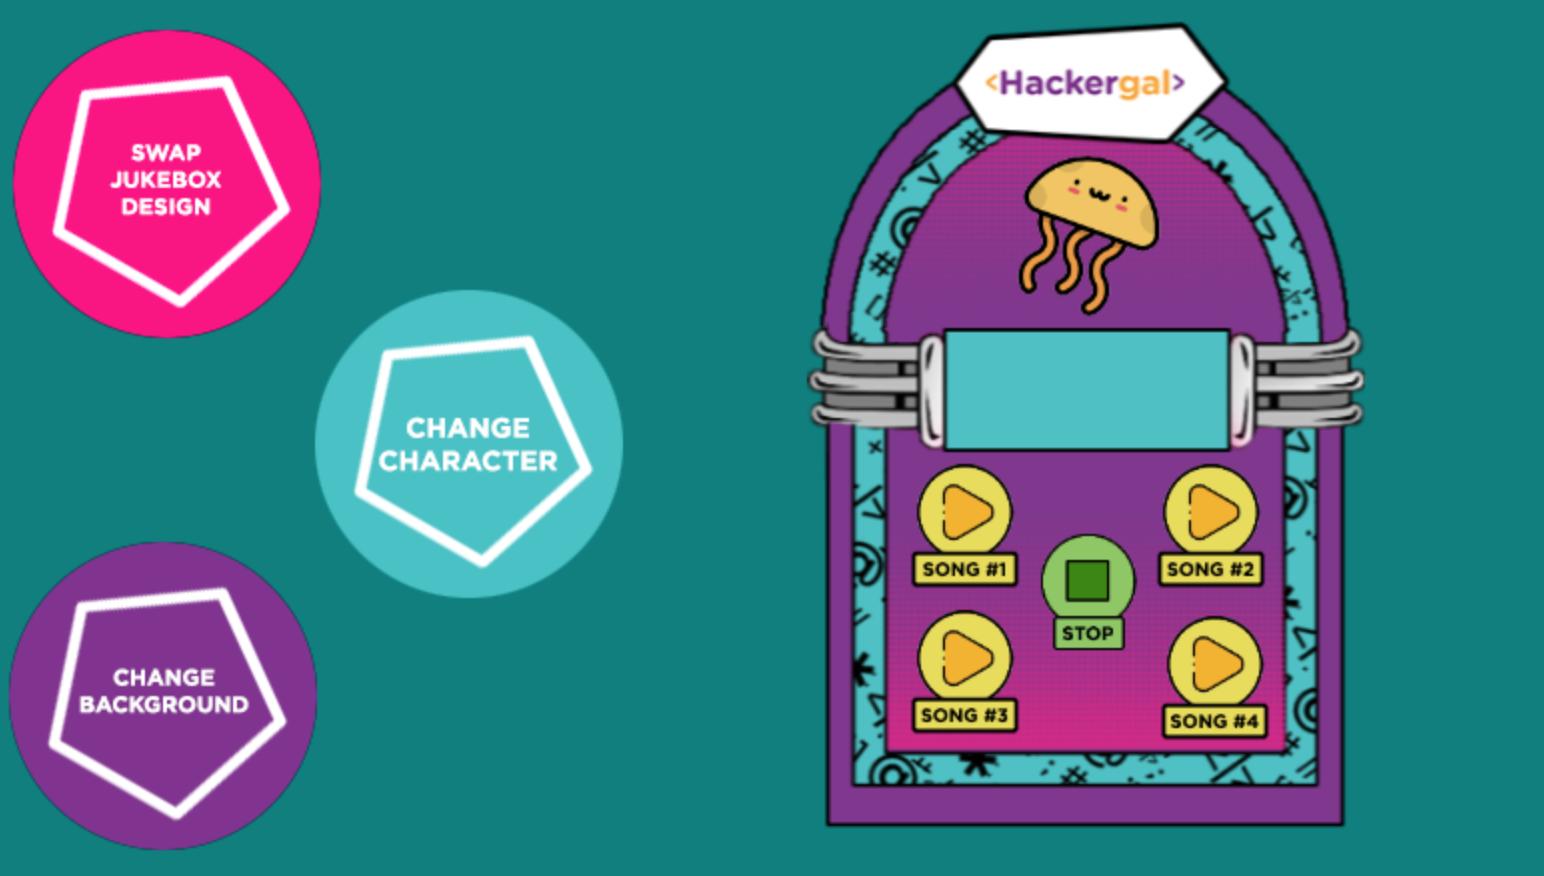 The Hackergal Jukebox